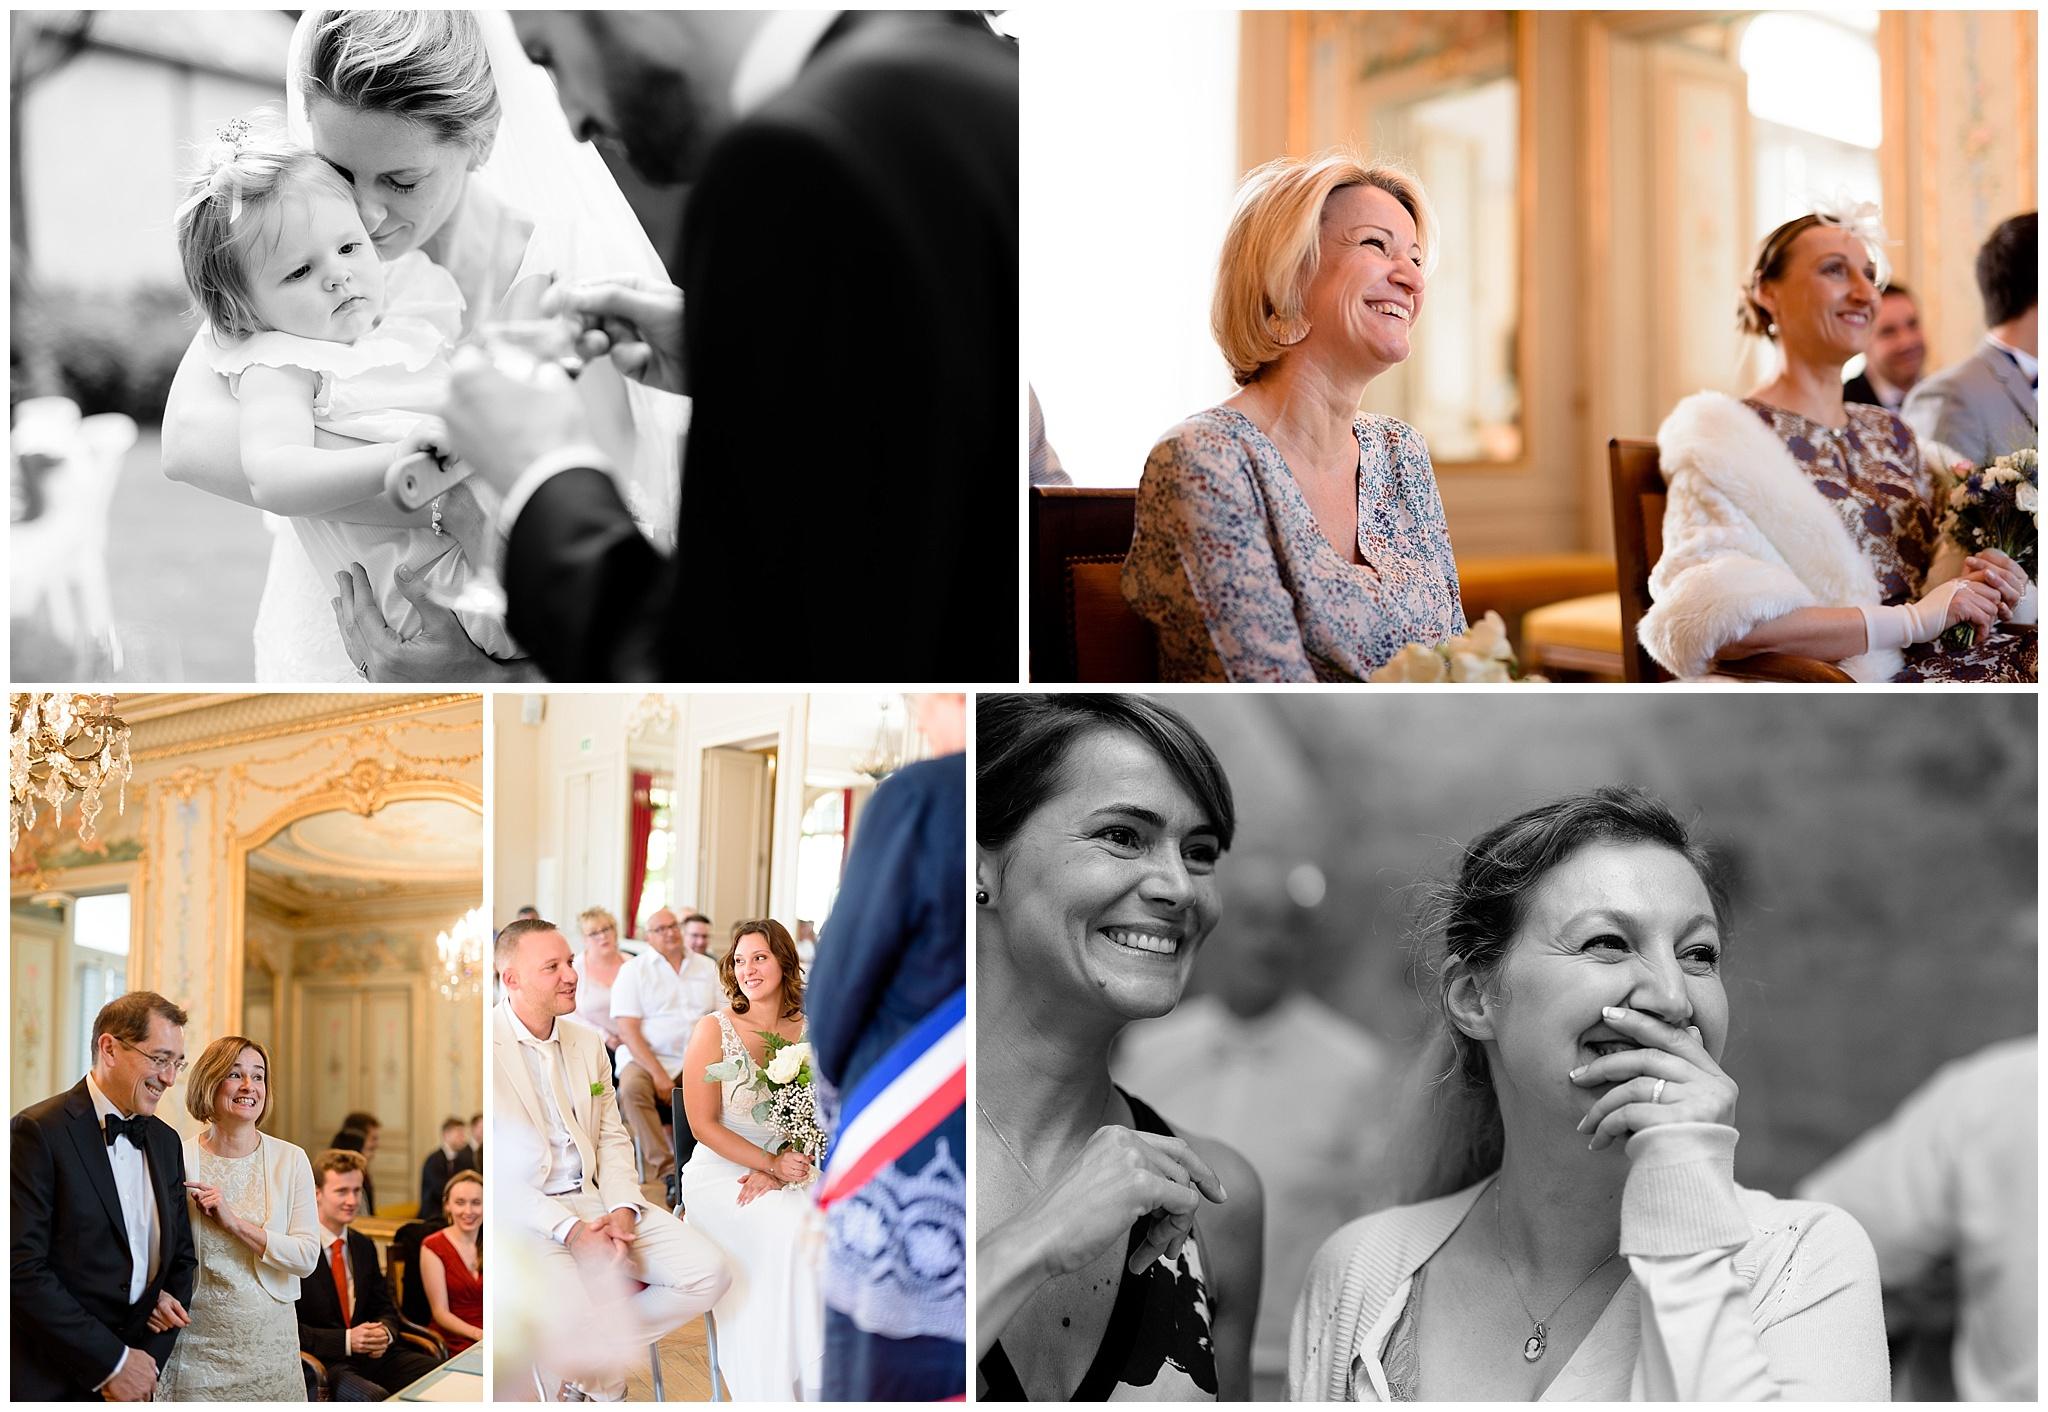 souvenirs mariage photos photographe Yvelines Paris chatou